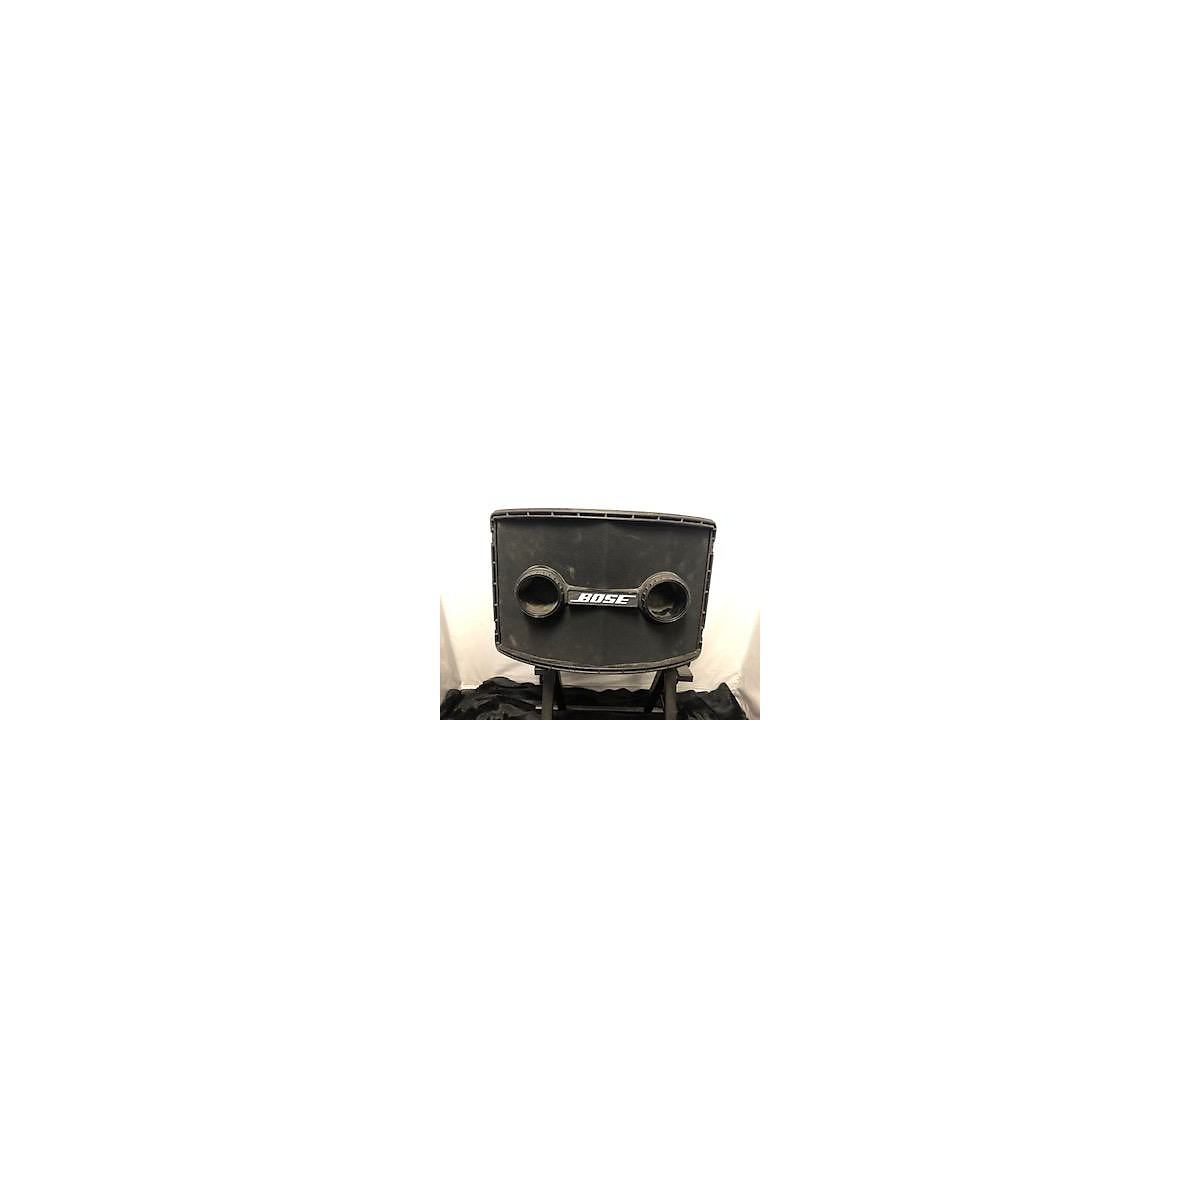 Bose 802 Series II Unpowered Speaker